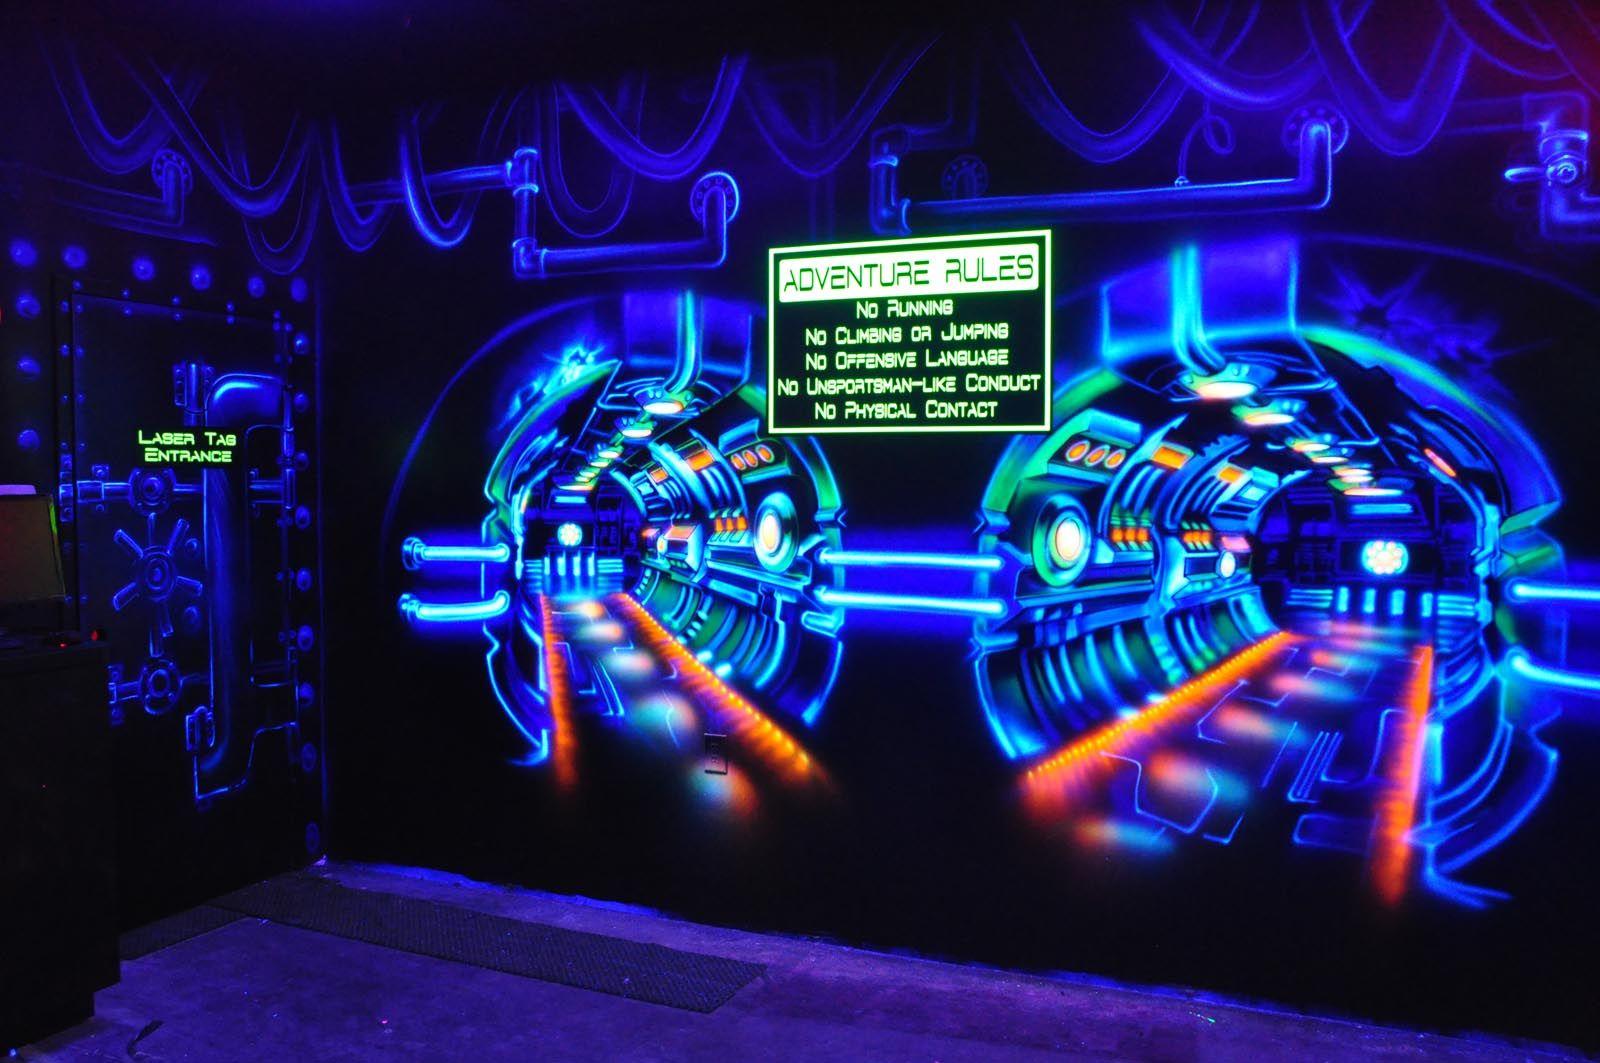 Laser Tag Floor Plan: Laser Tag Arena - Google Search